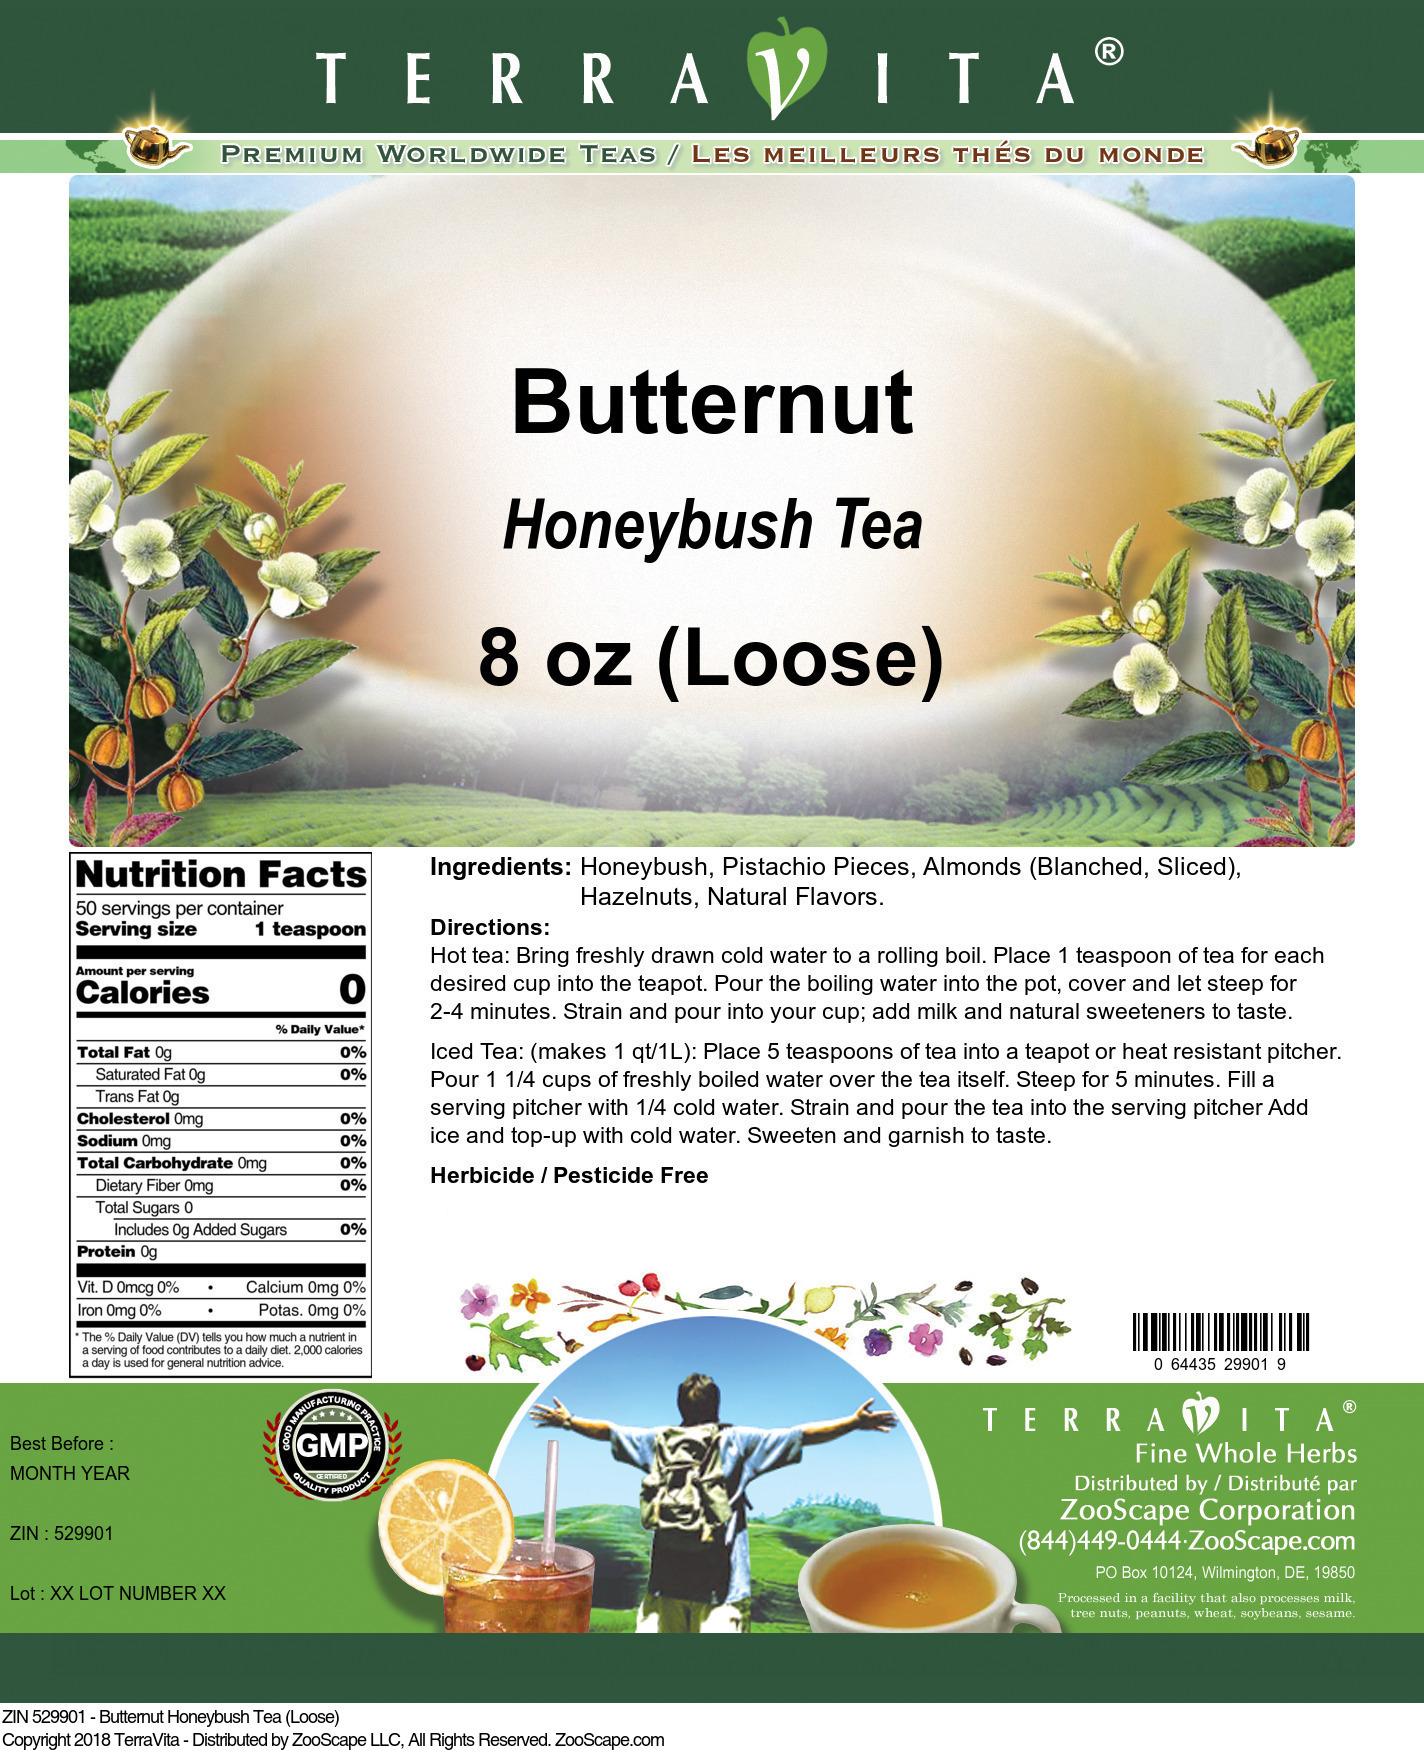 Butternut Honeybush Tea